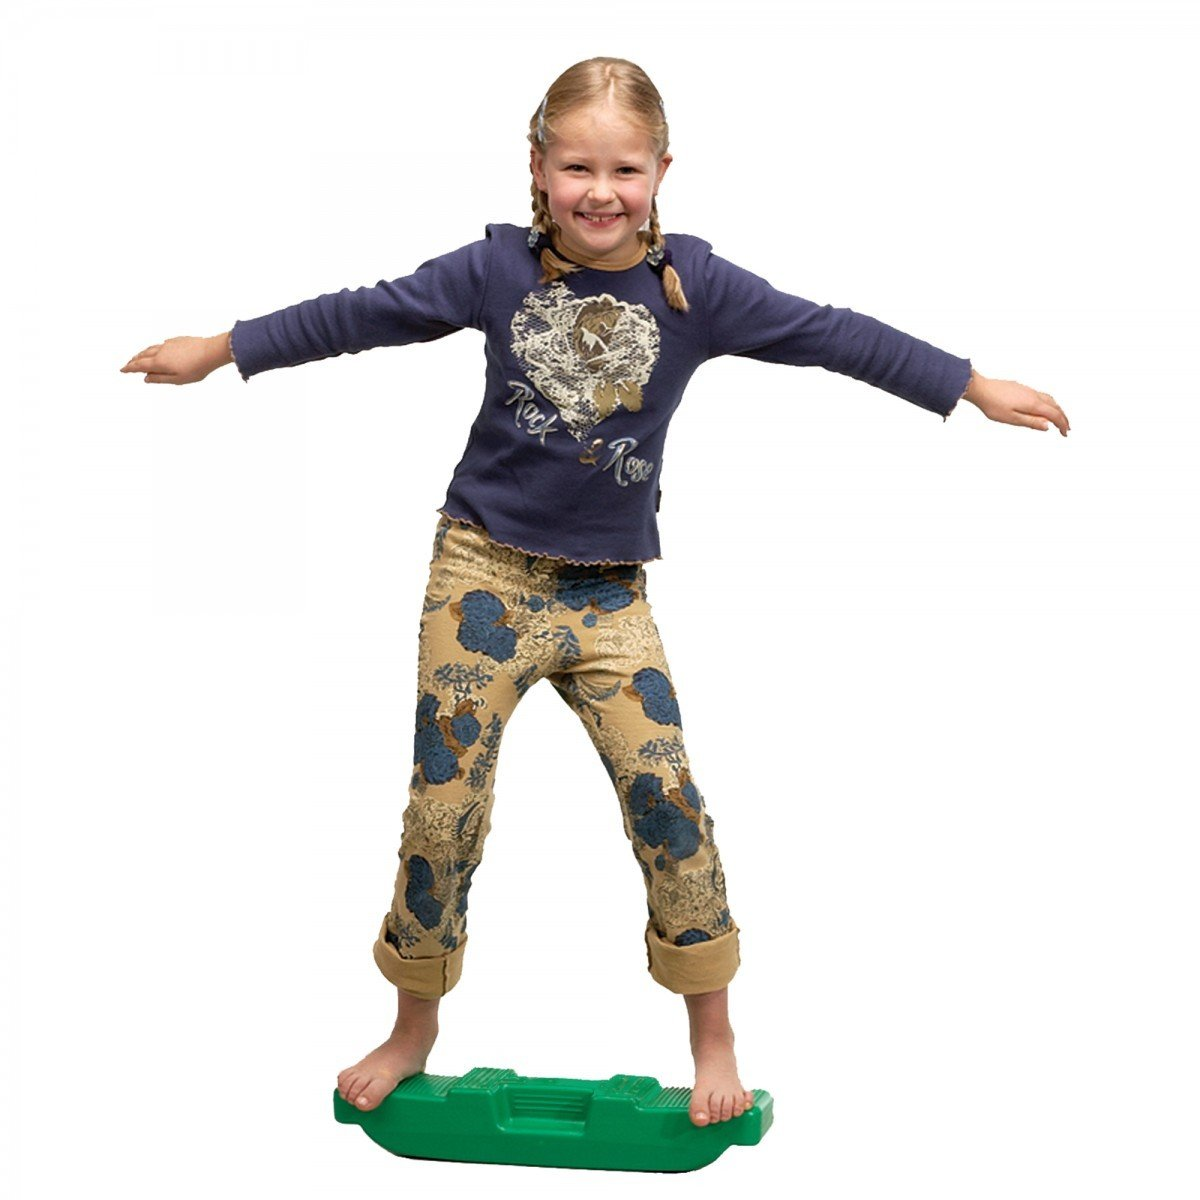 Gonge Wipp Walker 52x13x9, 5cm Koordination Balance Gleichgewicht Parcours grün Erhard Sport